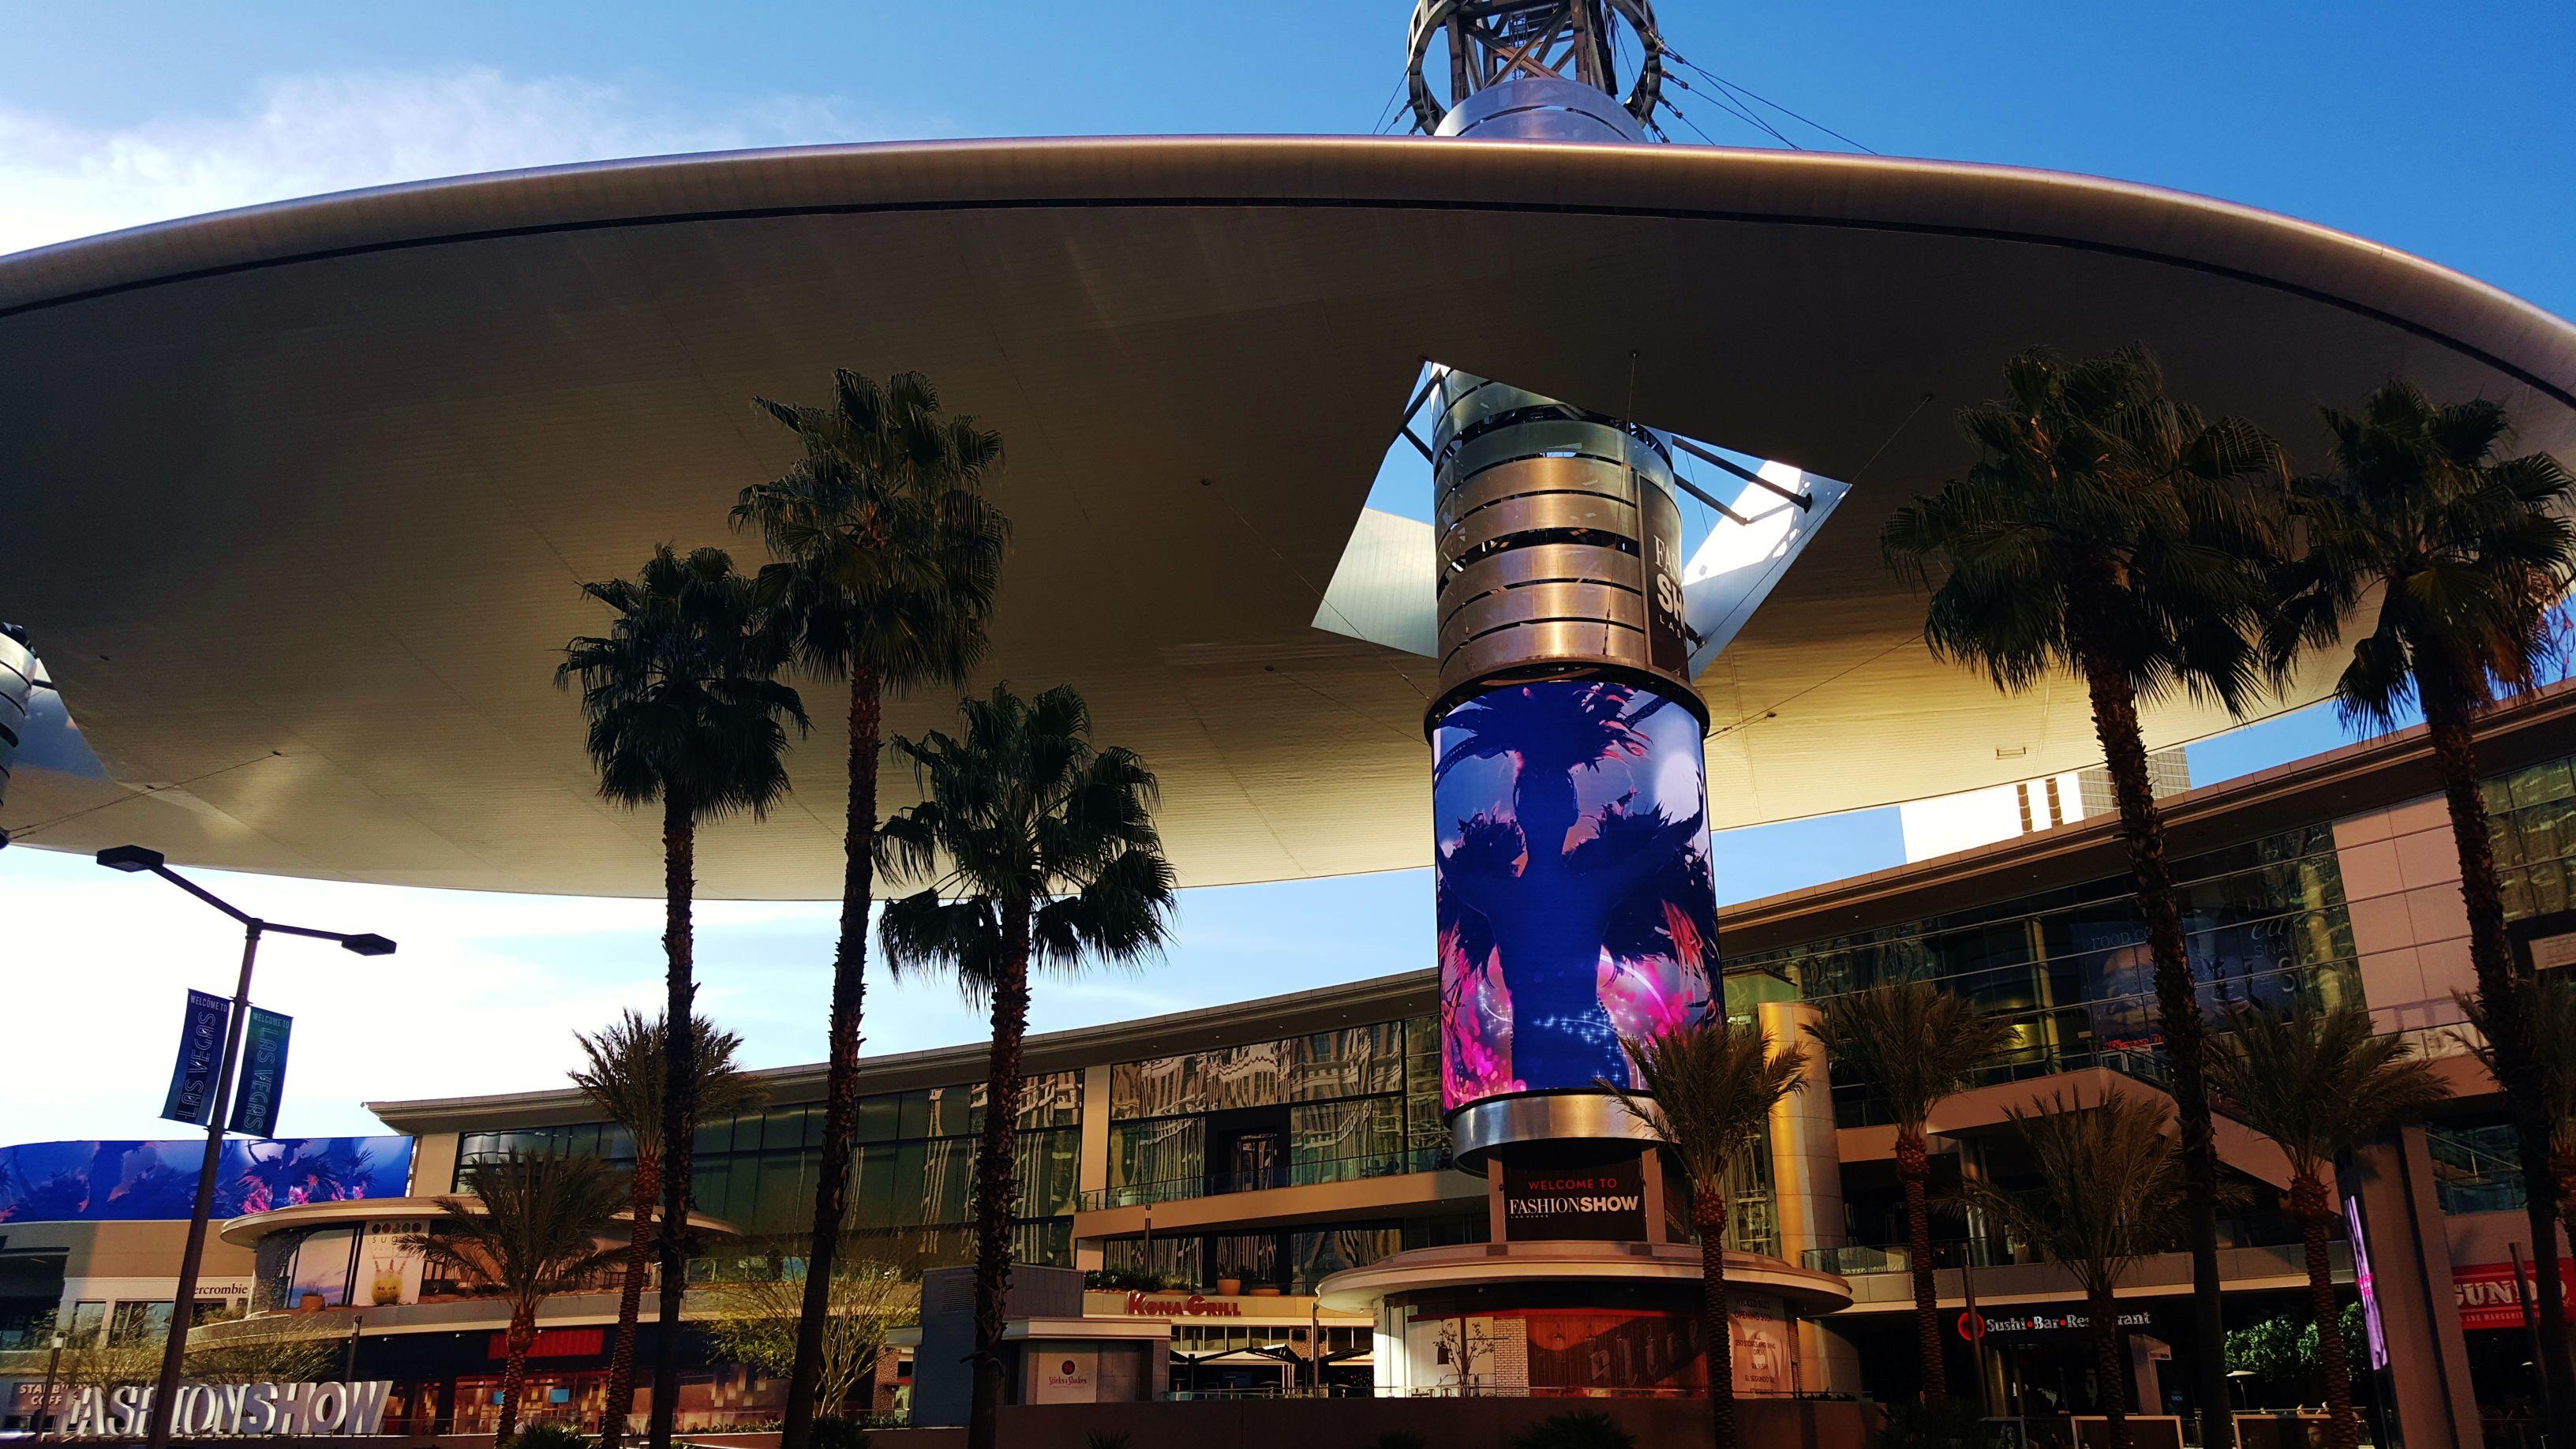 Fashion Show Mall in Las Vegas